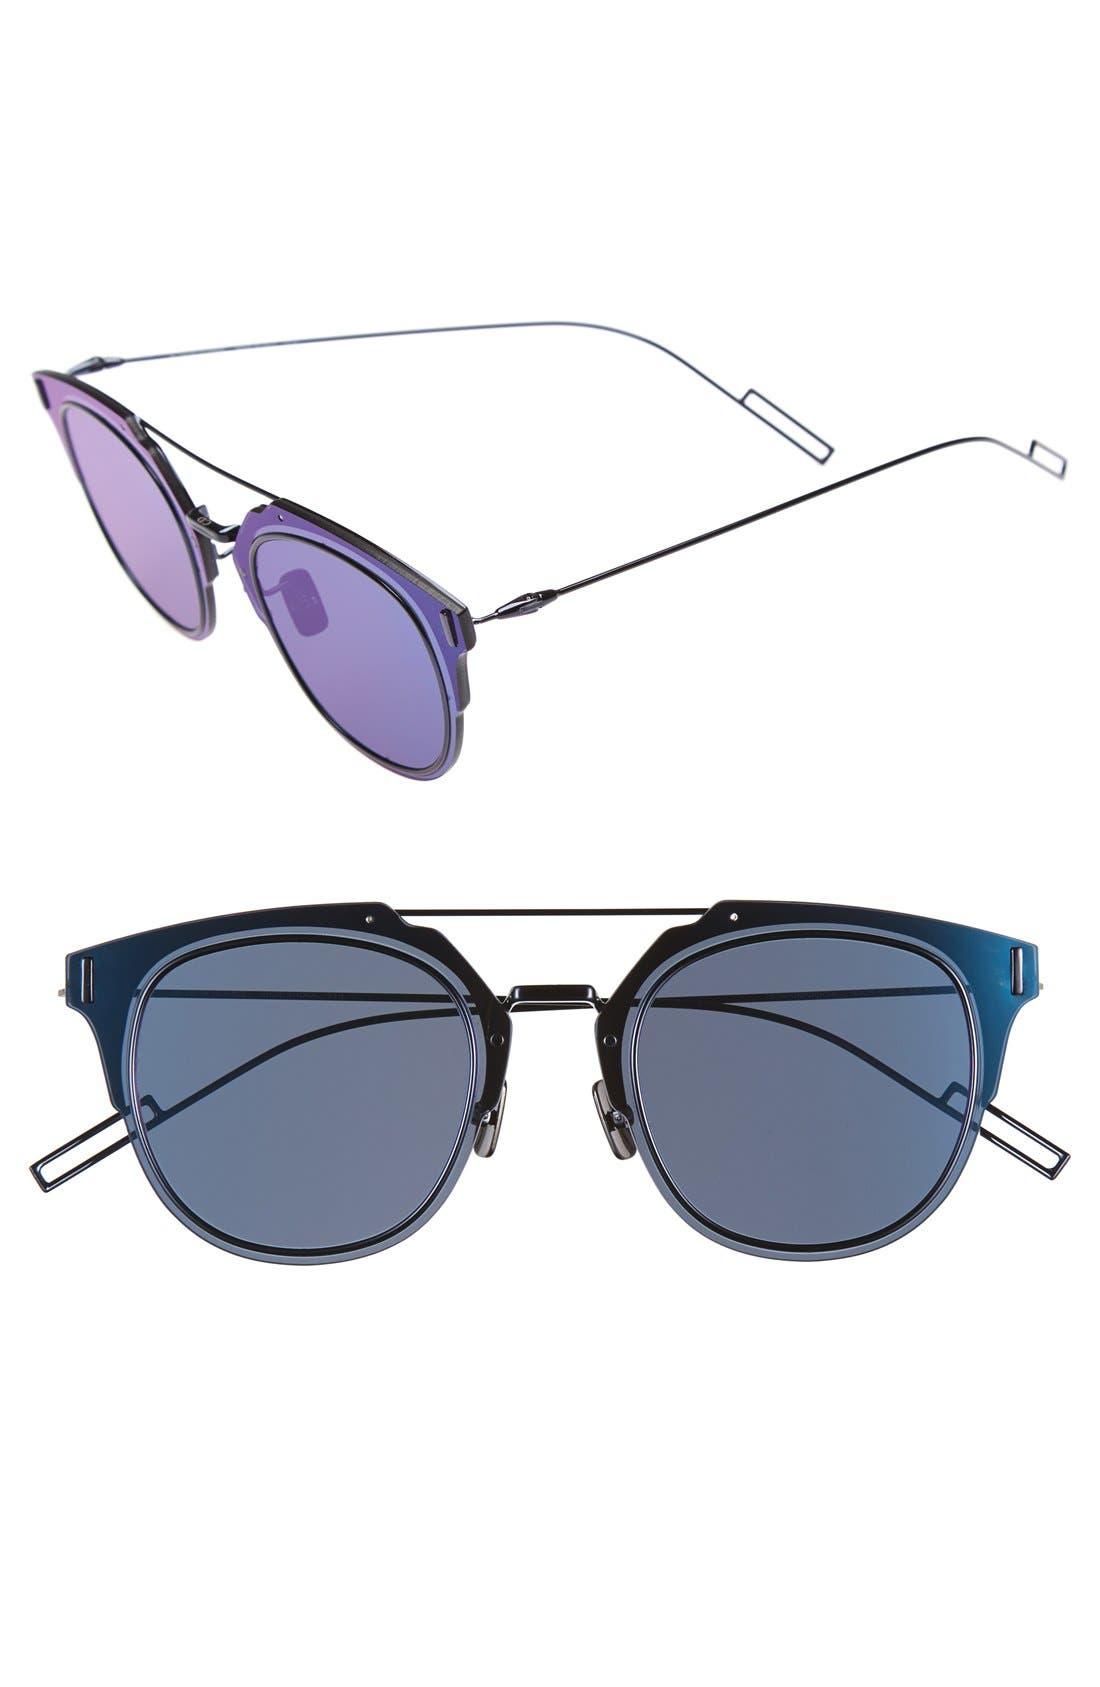 'Composit 1.0S' 62mm Metal Shield Sunglasses,                             Main thumbnail 1, color,                             Shiny Blue Ruthenium/ Blue